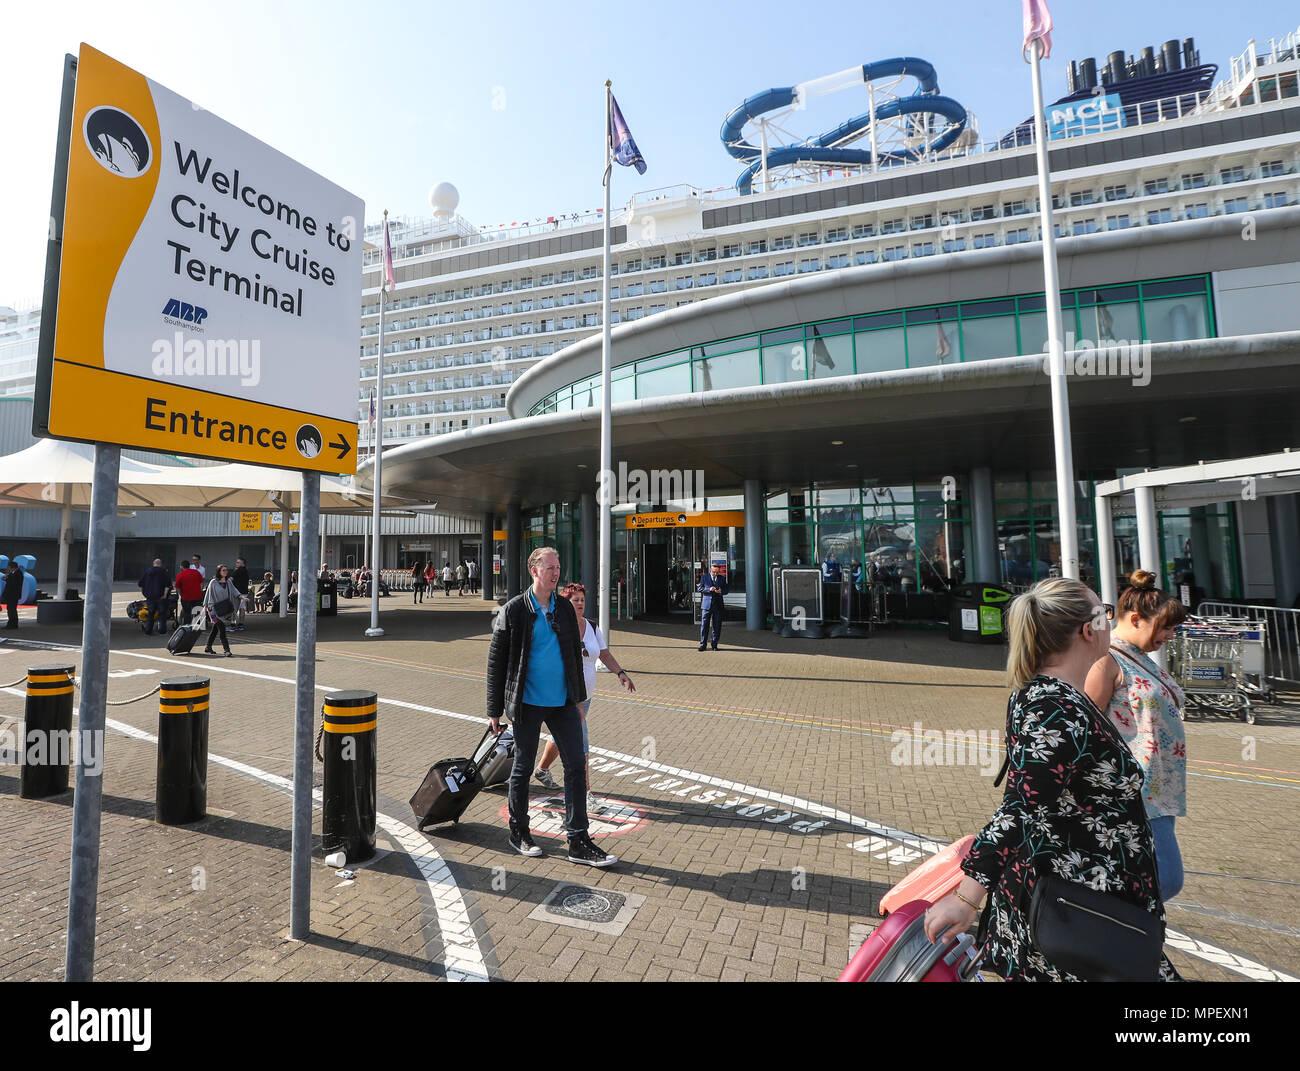 Southampton City Cruise Terminal exterior, Southampton Docks - Stock Image